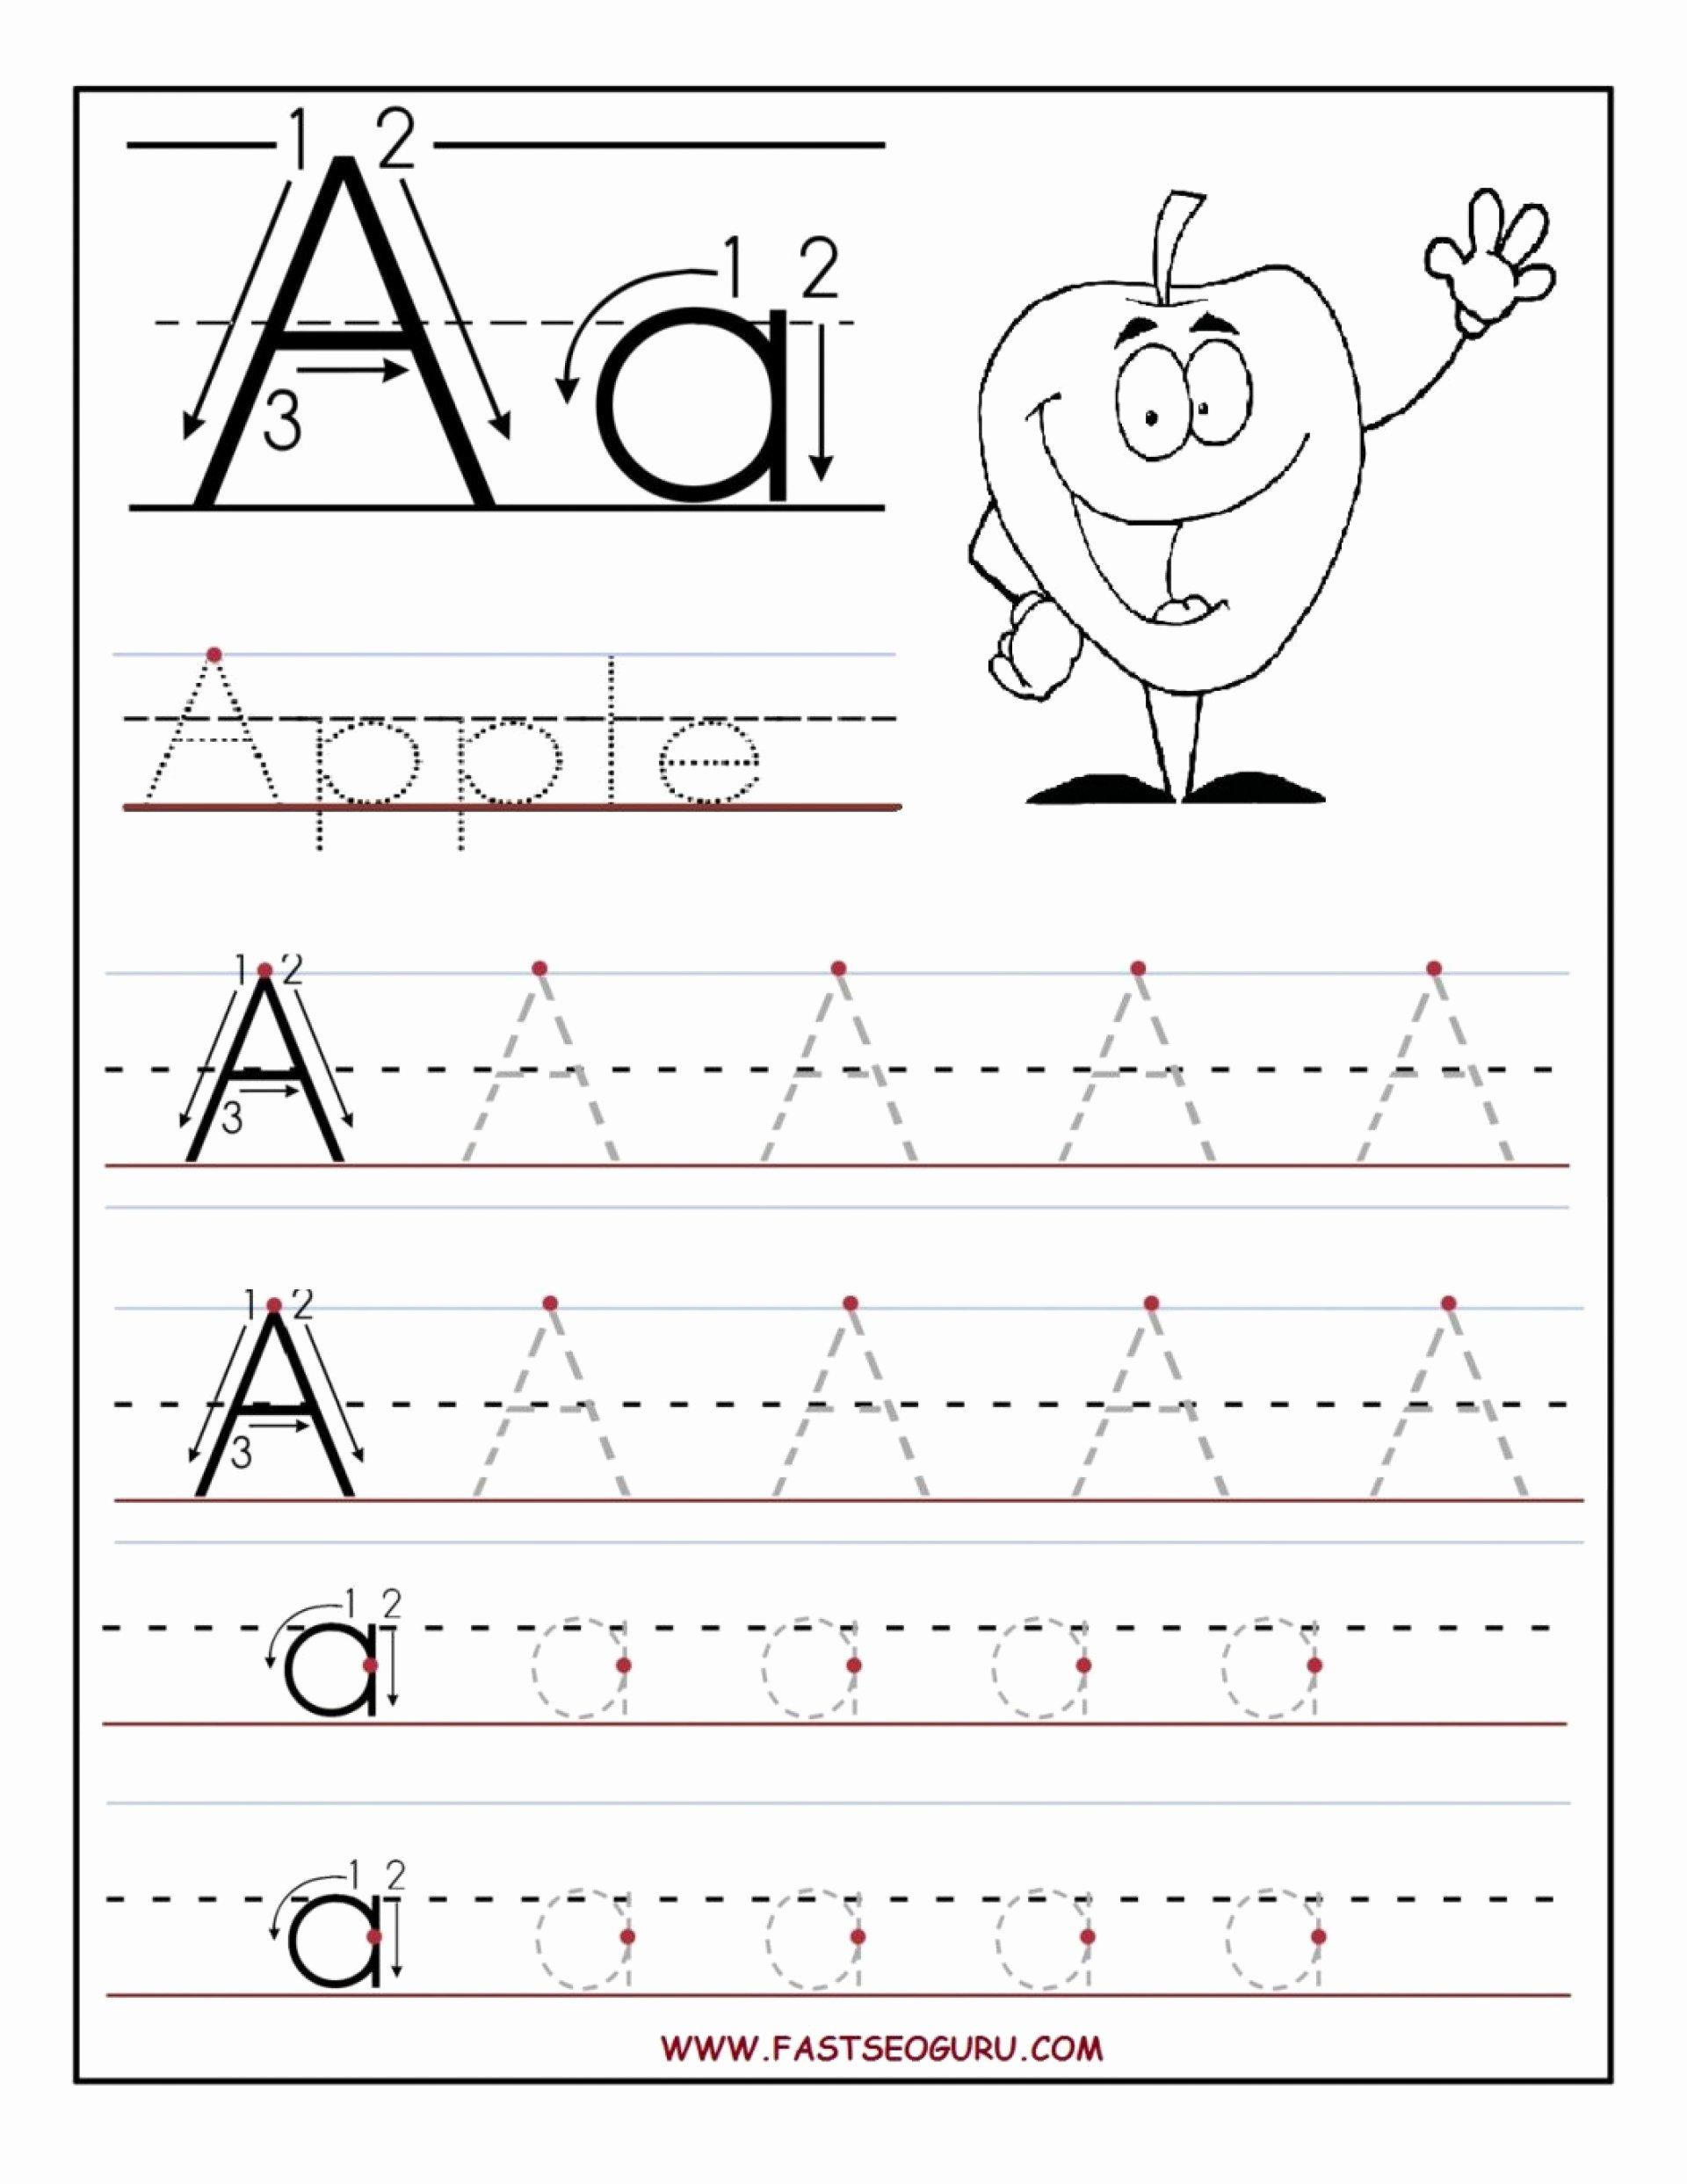 Alphabet Learning Worksheets for Preschoolers Fresh Coloring Book Preschool Free Printable Worksheets Tracing